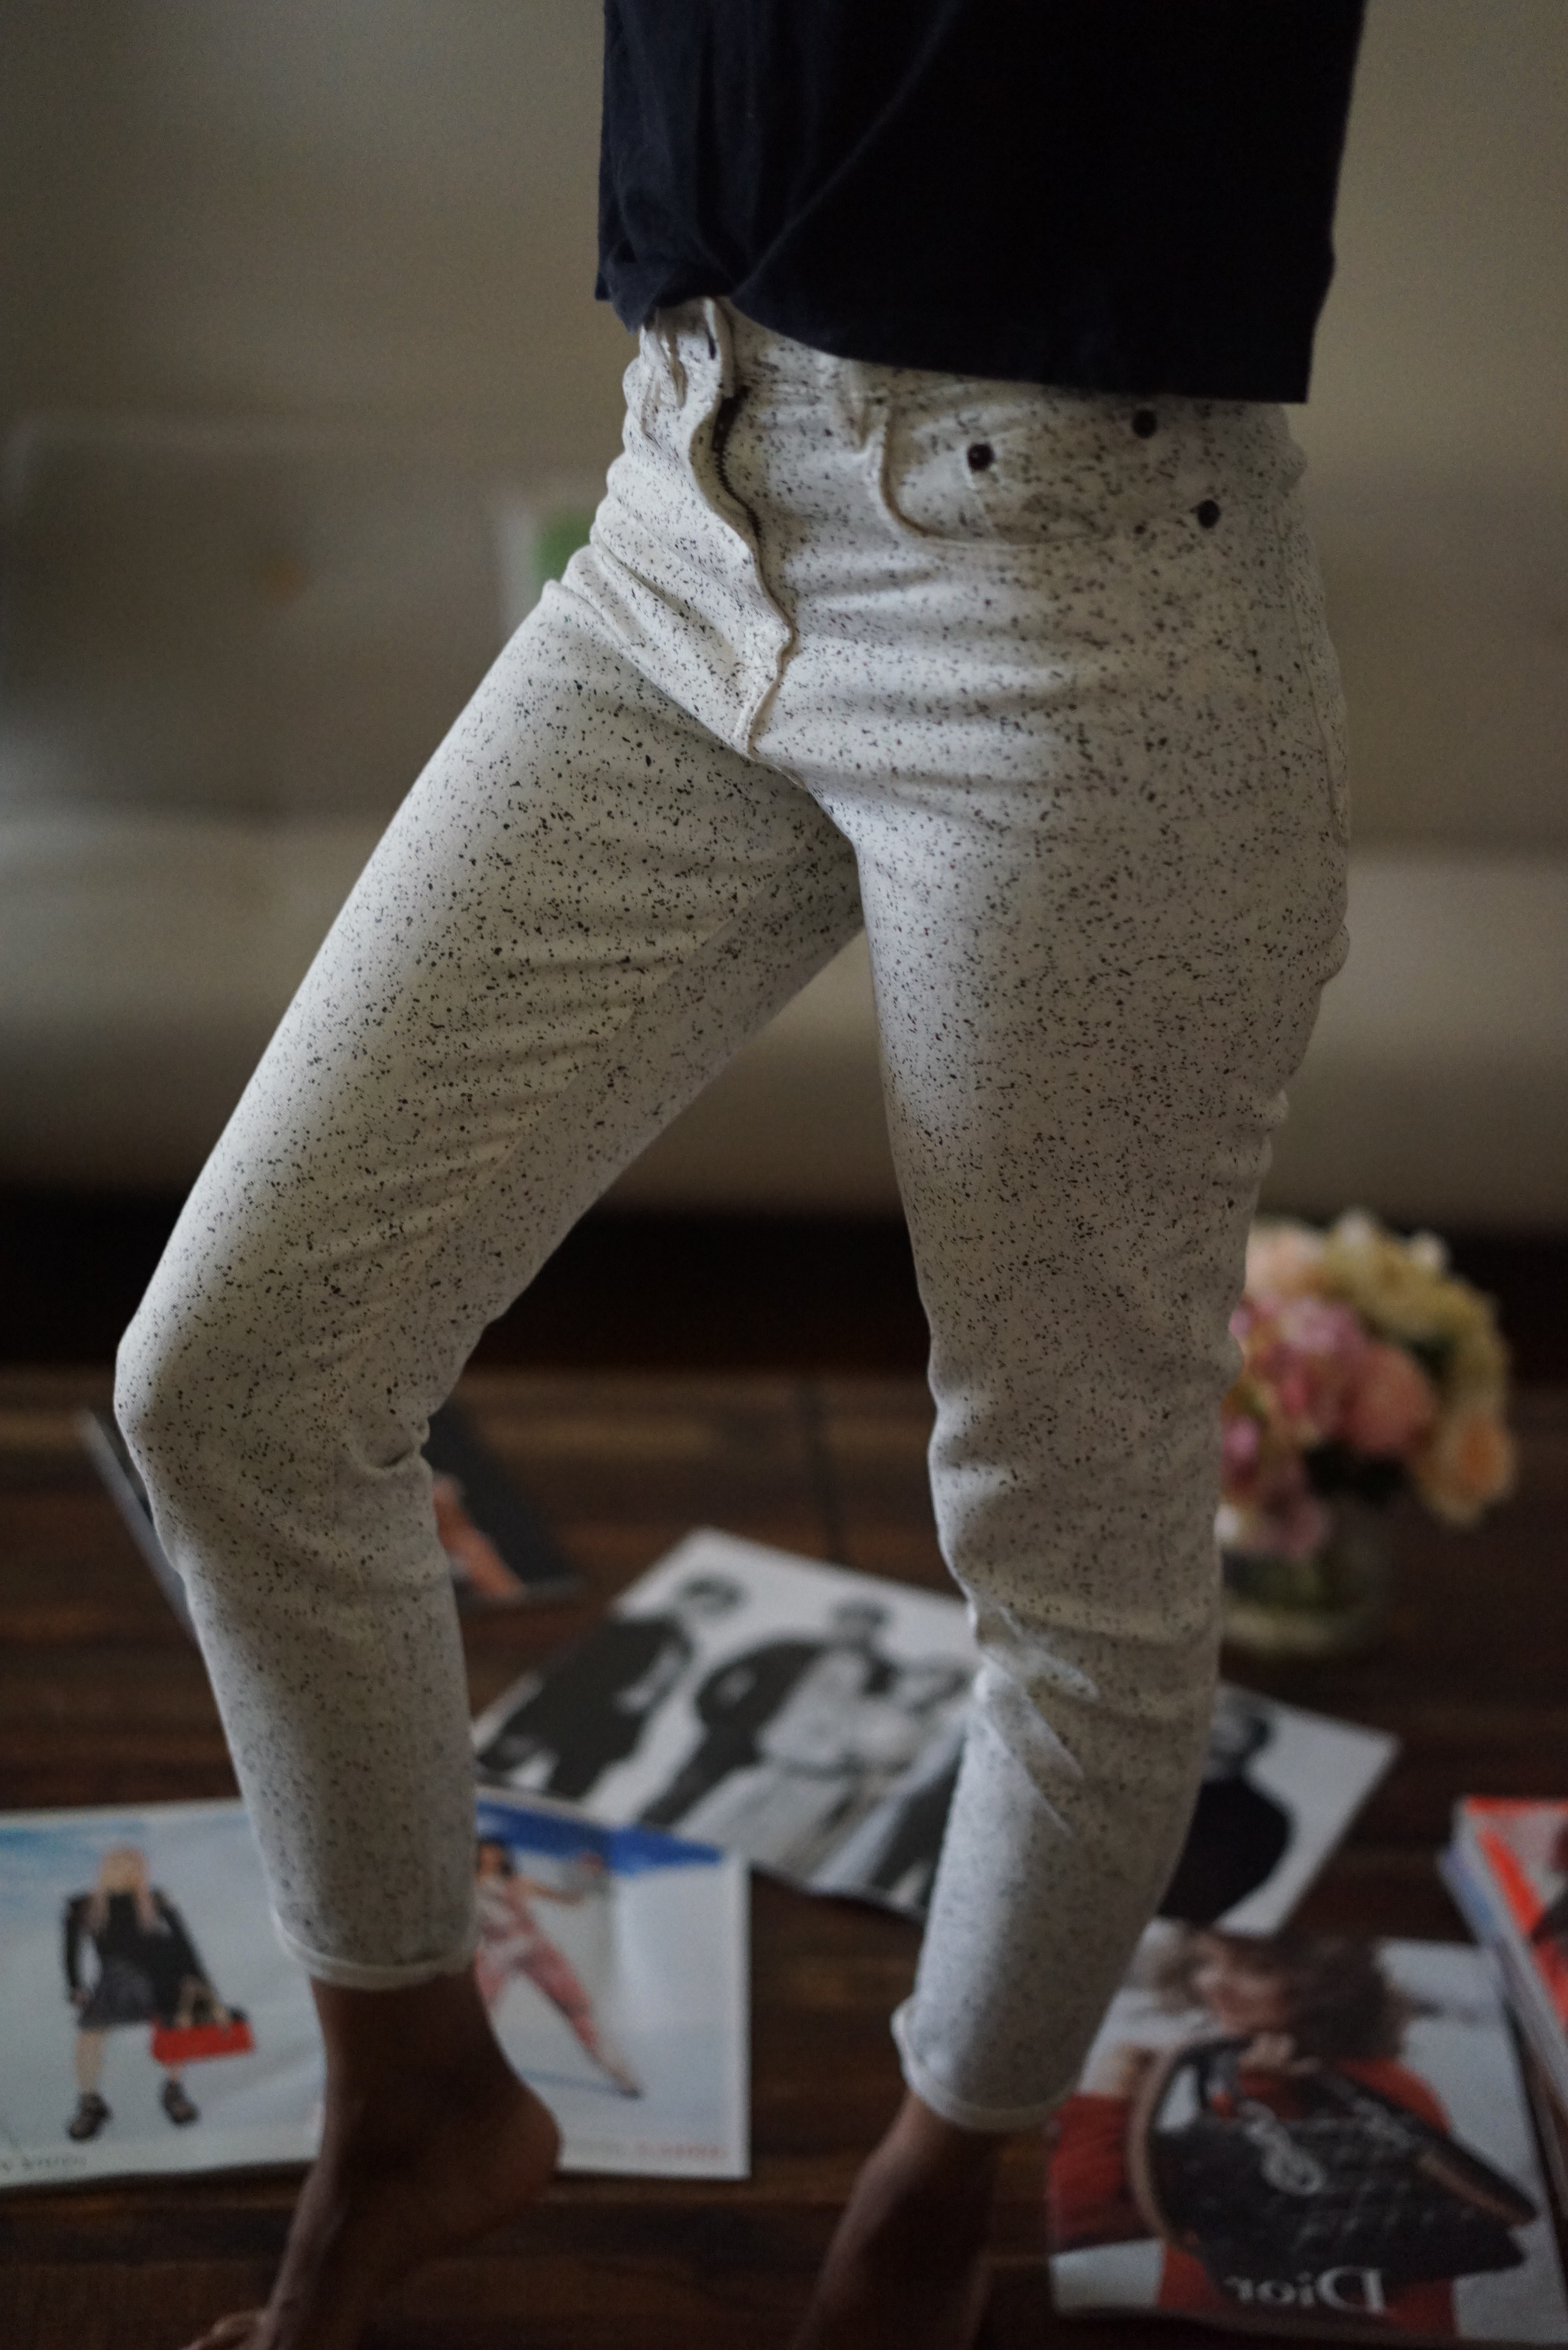 Christine_the_style_d'affaire_proenza_schouler_designer_jeans_white_black_sophistication_fashion_forward_editorial_shirt_trend_fall_Jack_McCollough_Lazaro_Hernandez_summer_nordstrom_hautelook_mood.jpg